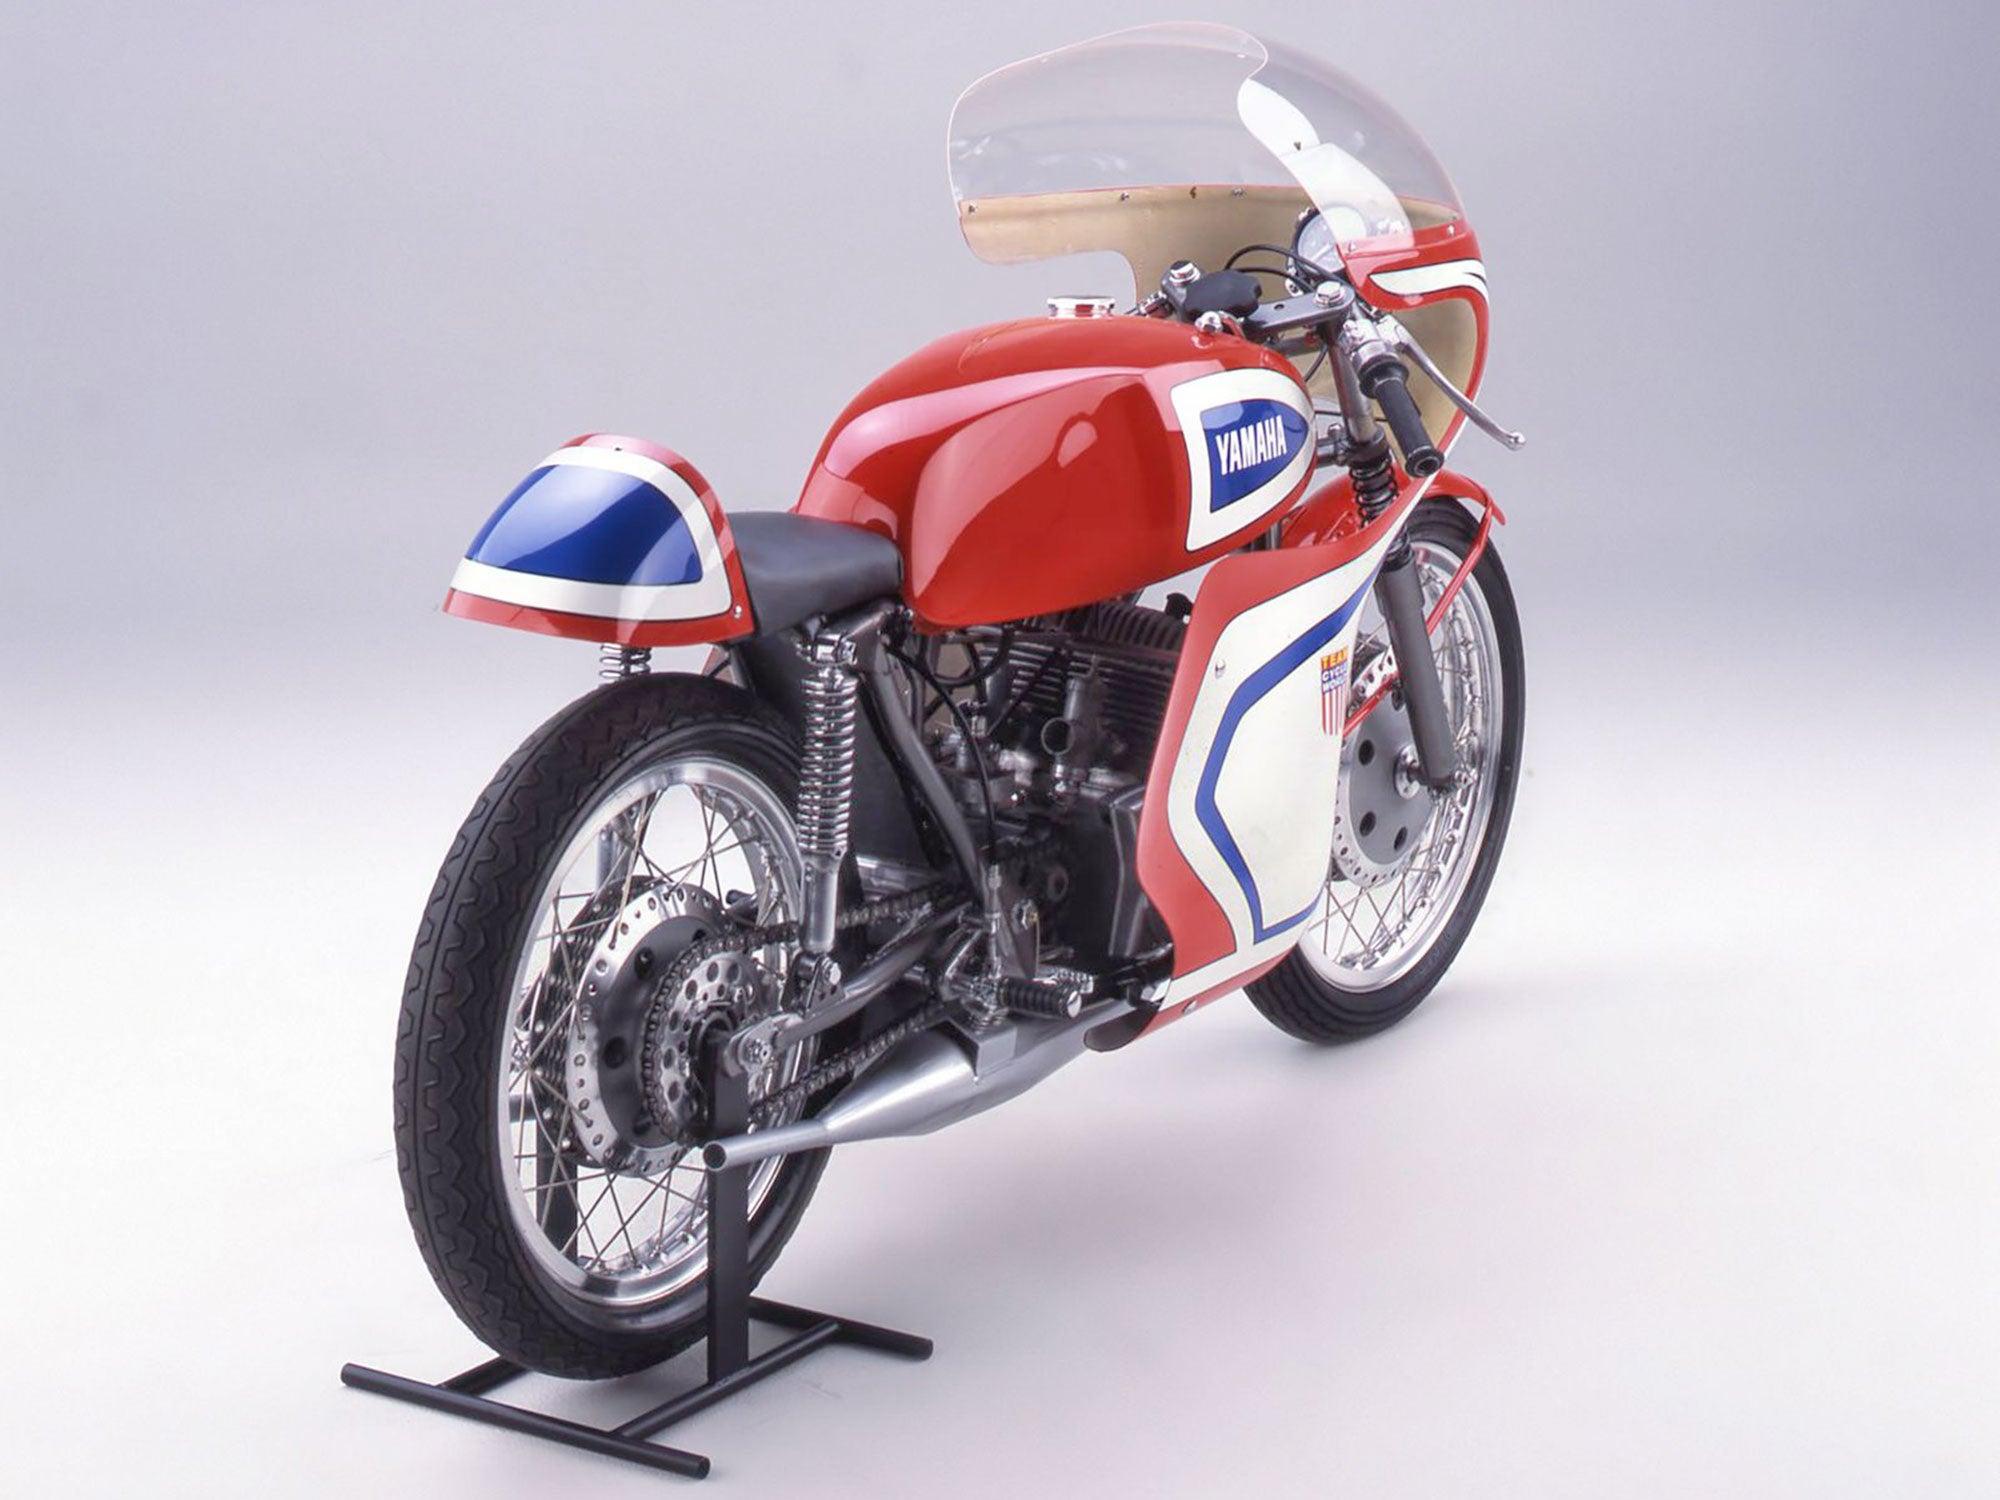 Yamaha's TD1-B